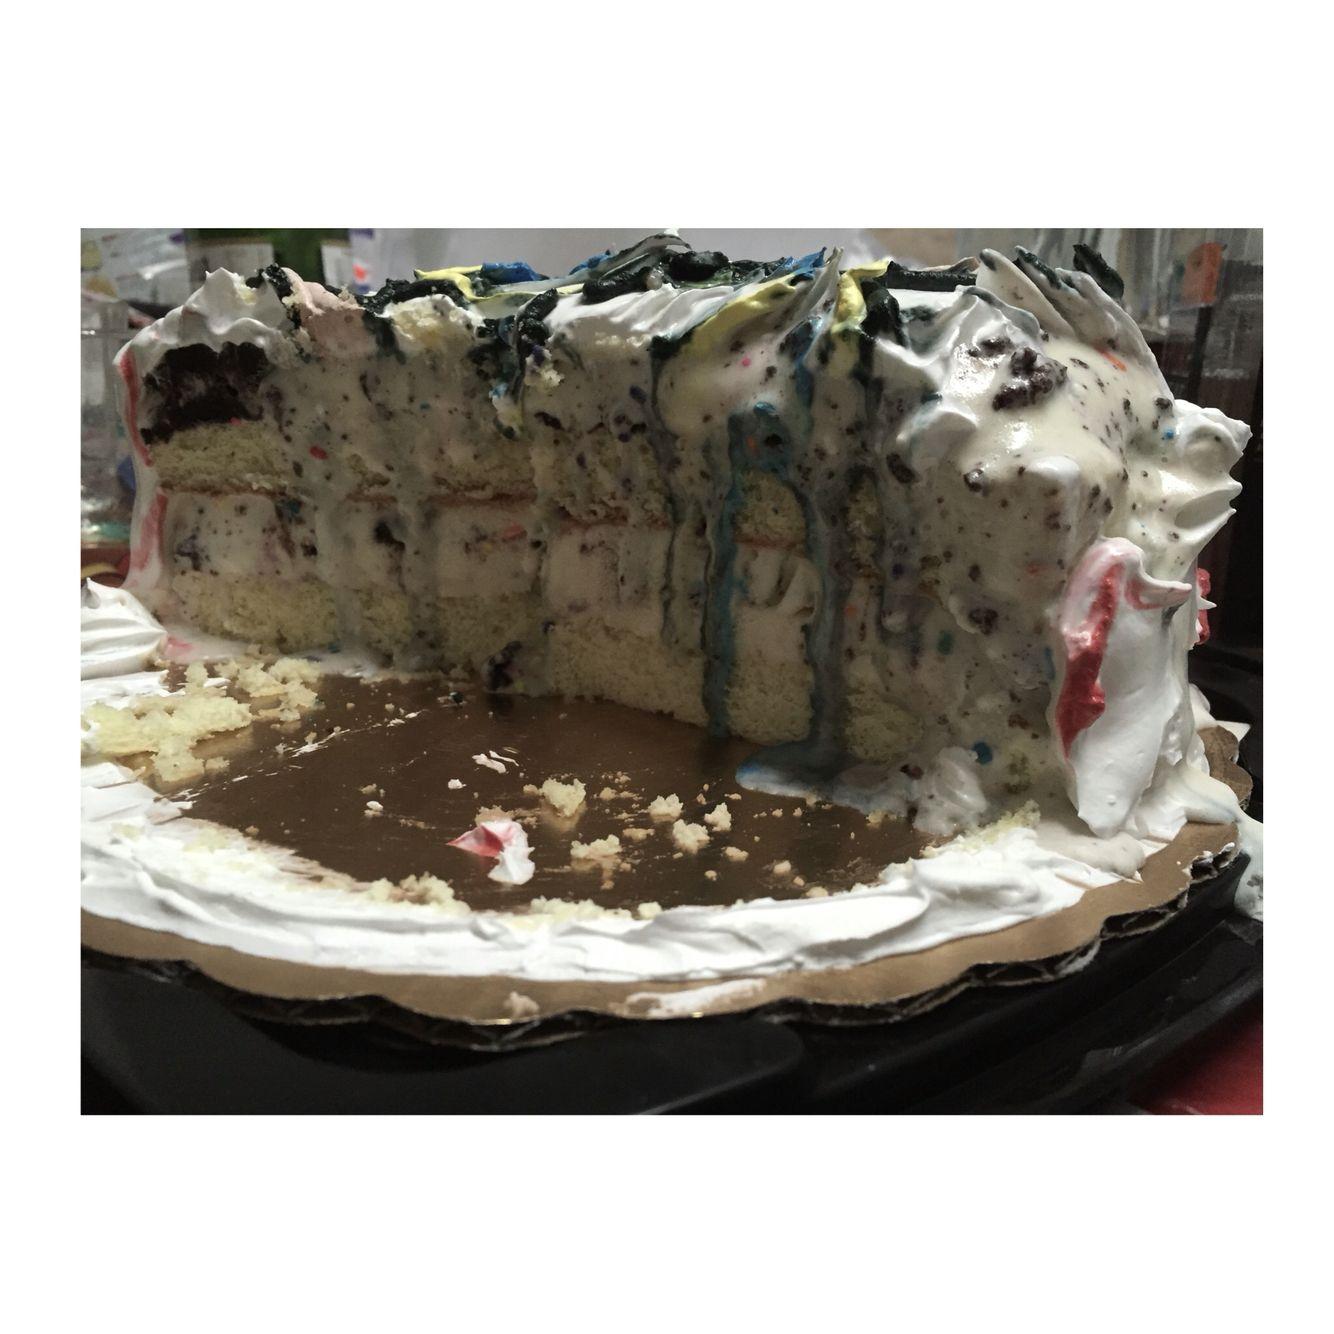 Cold stone birthday cake remix cake cake desserts food